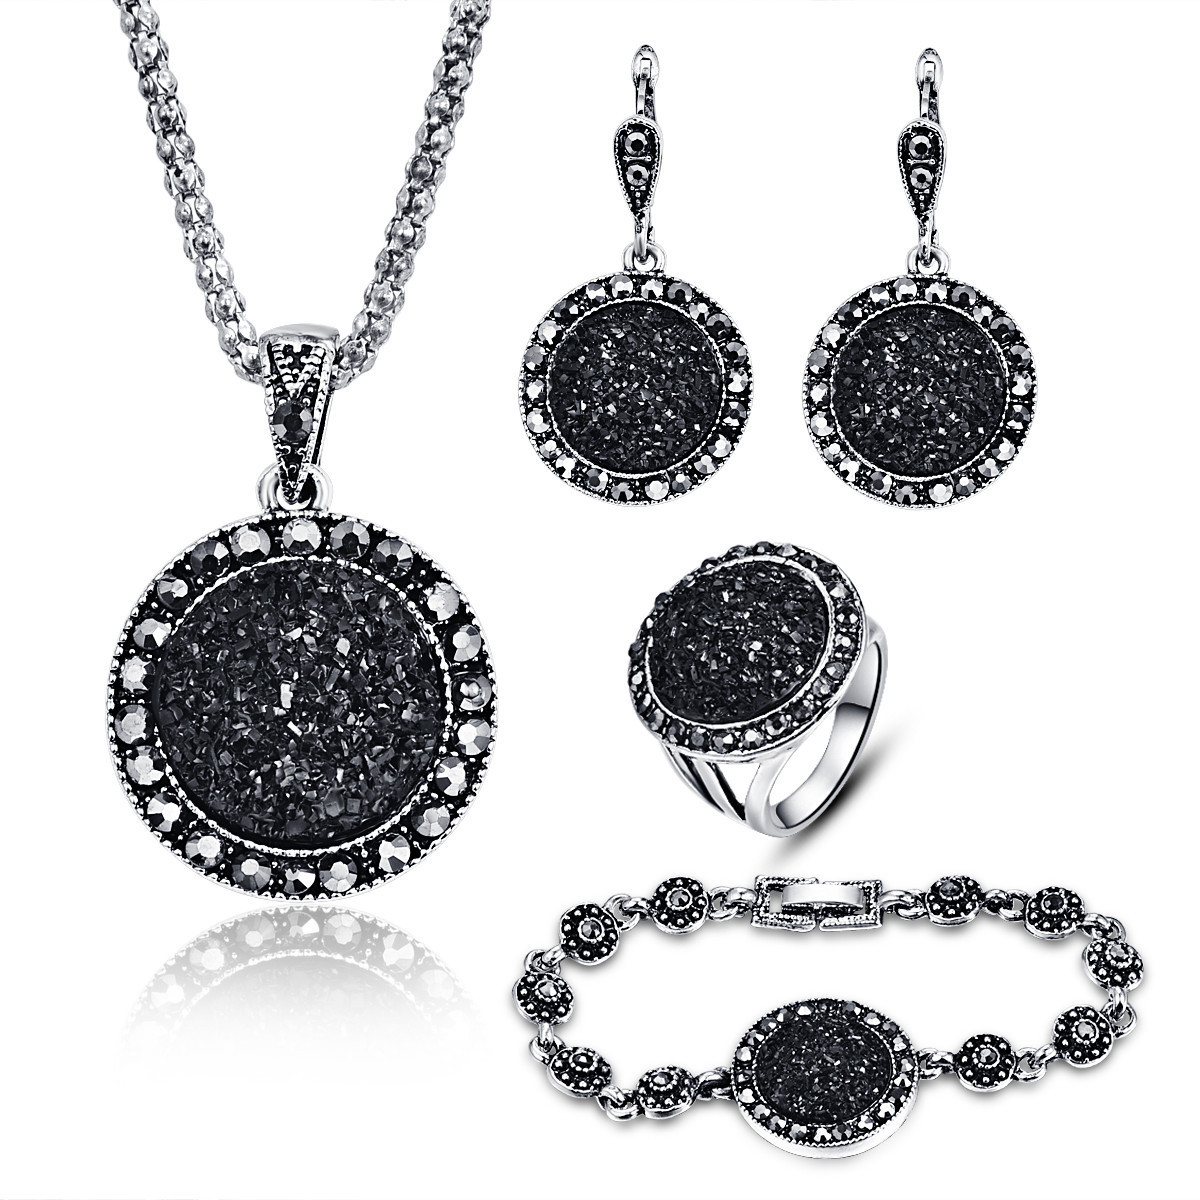 Boho Jewelry Sets Women Vintage Gothic Earrings Sets Fashion Women Jewelry Set Crystal Round Pendant Necklace Sets 4Pcs